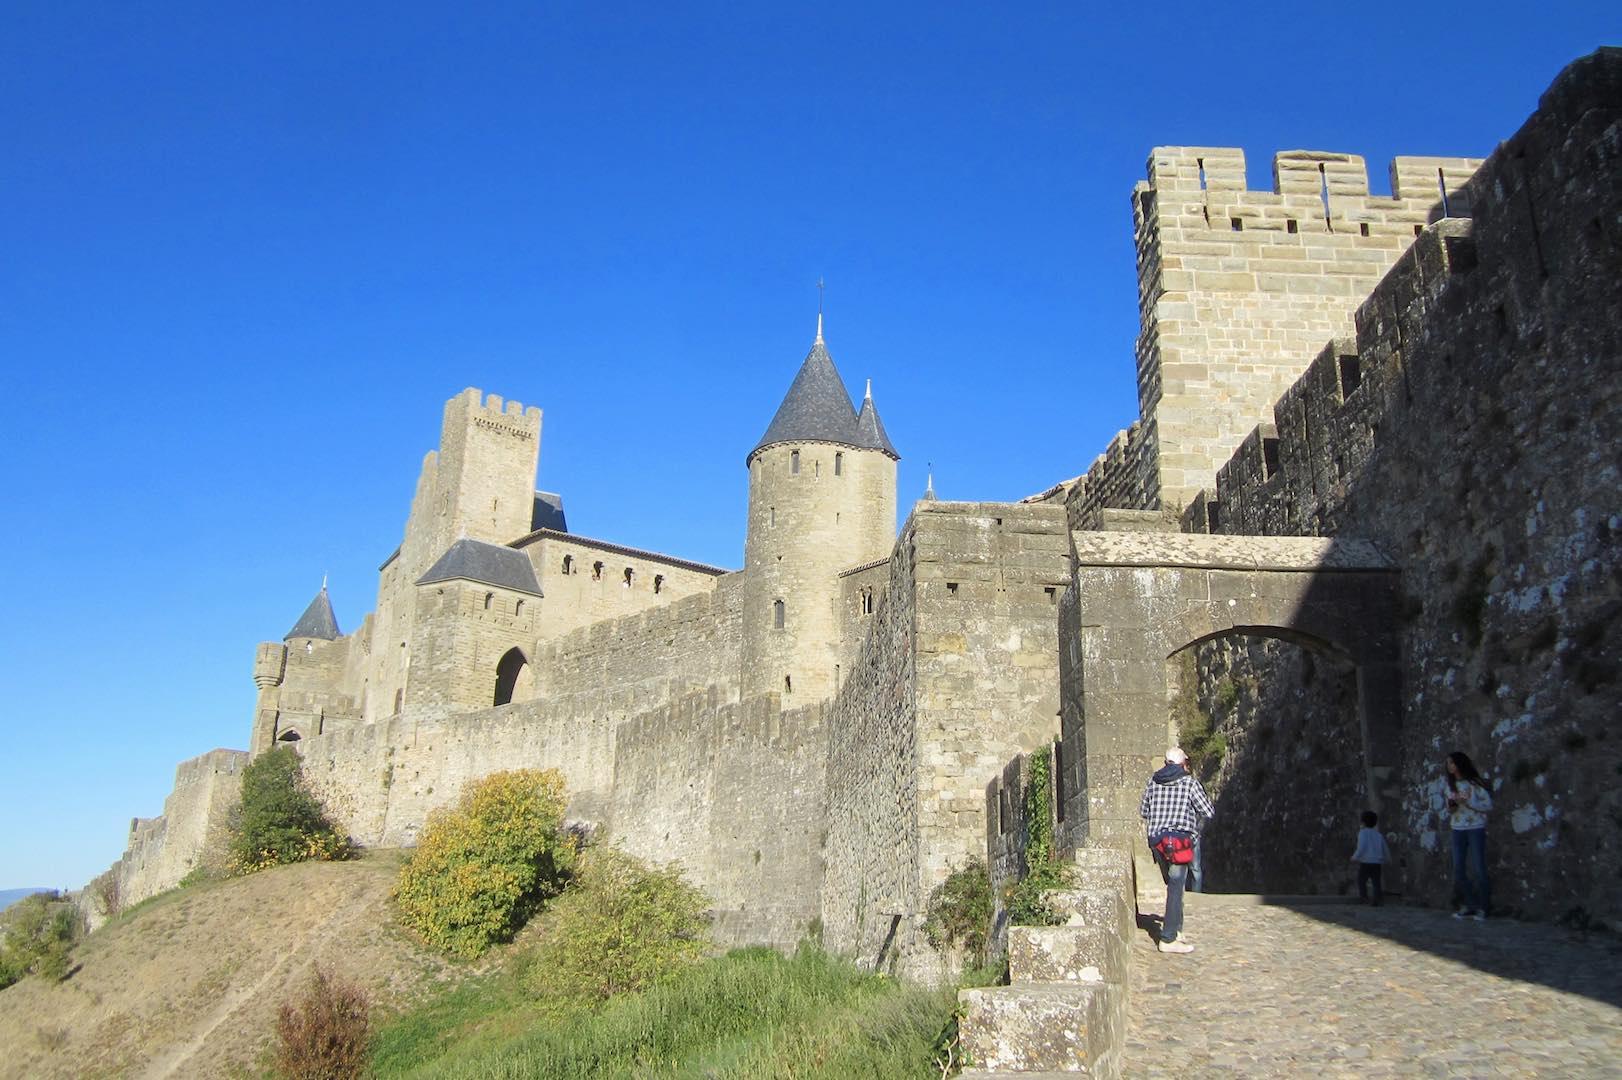 turismo carcassonne que ver en carcasona francia. Black Bedroom Furniture Sets. Home Design Ideas